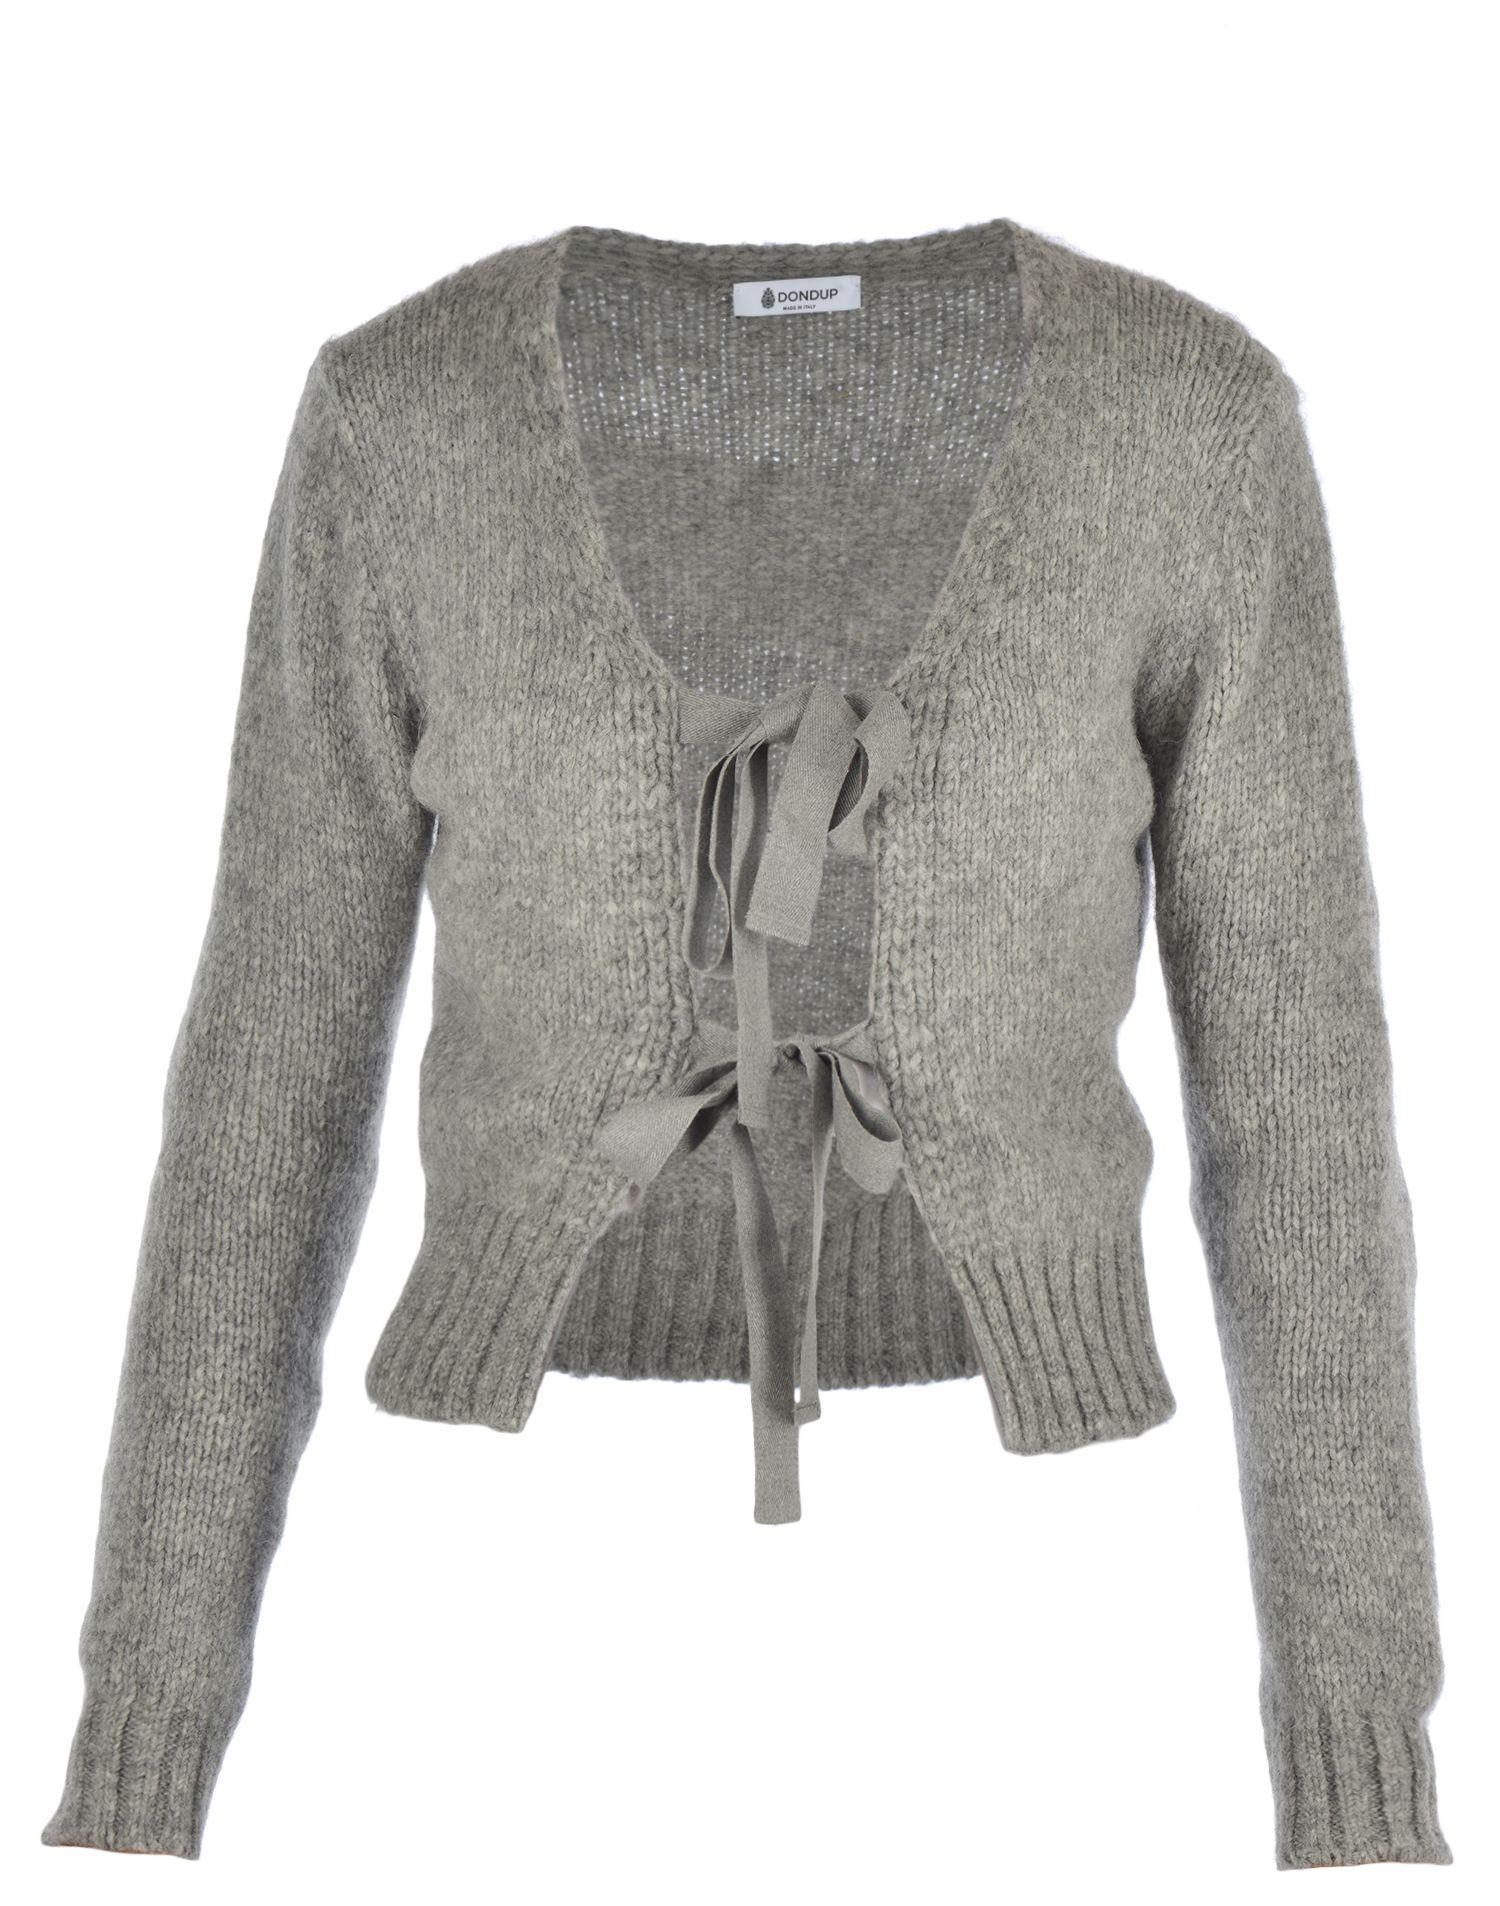 Dondup Wool Cardigan In Grey